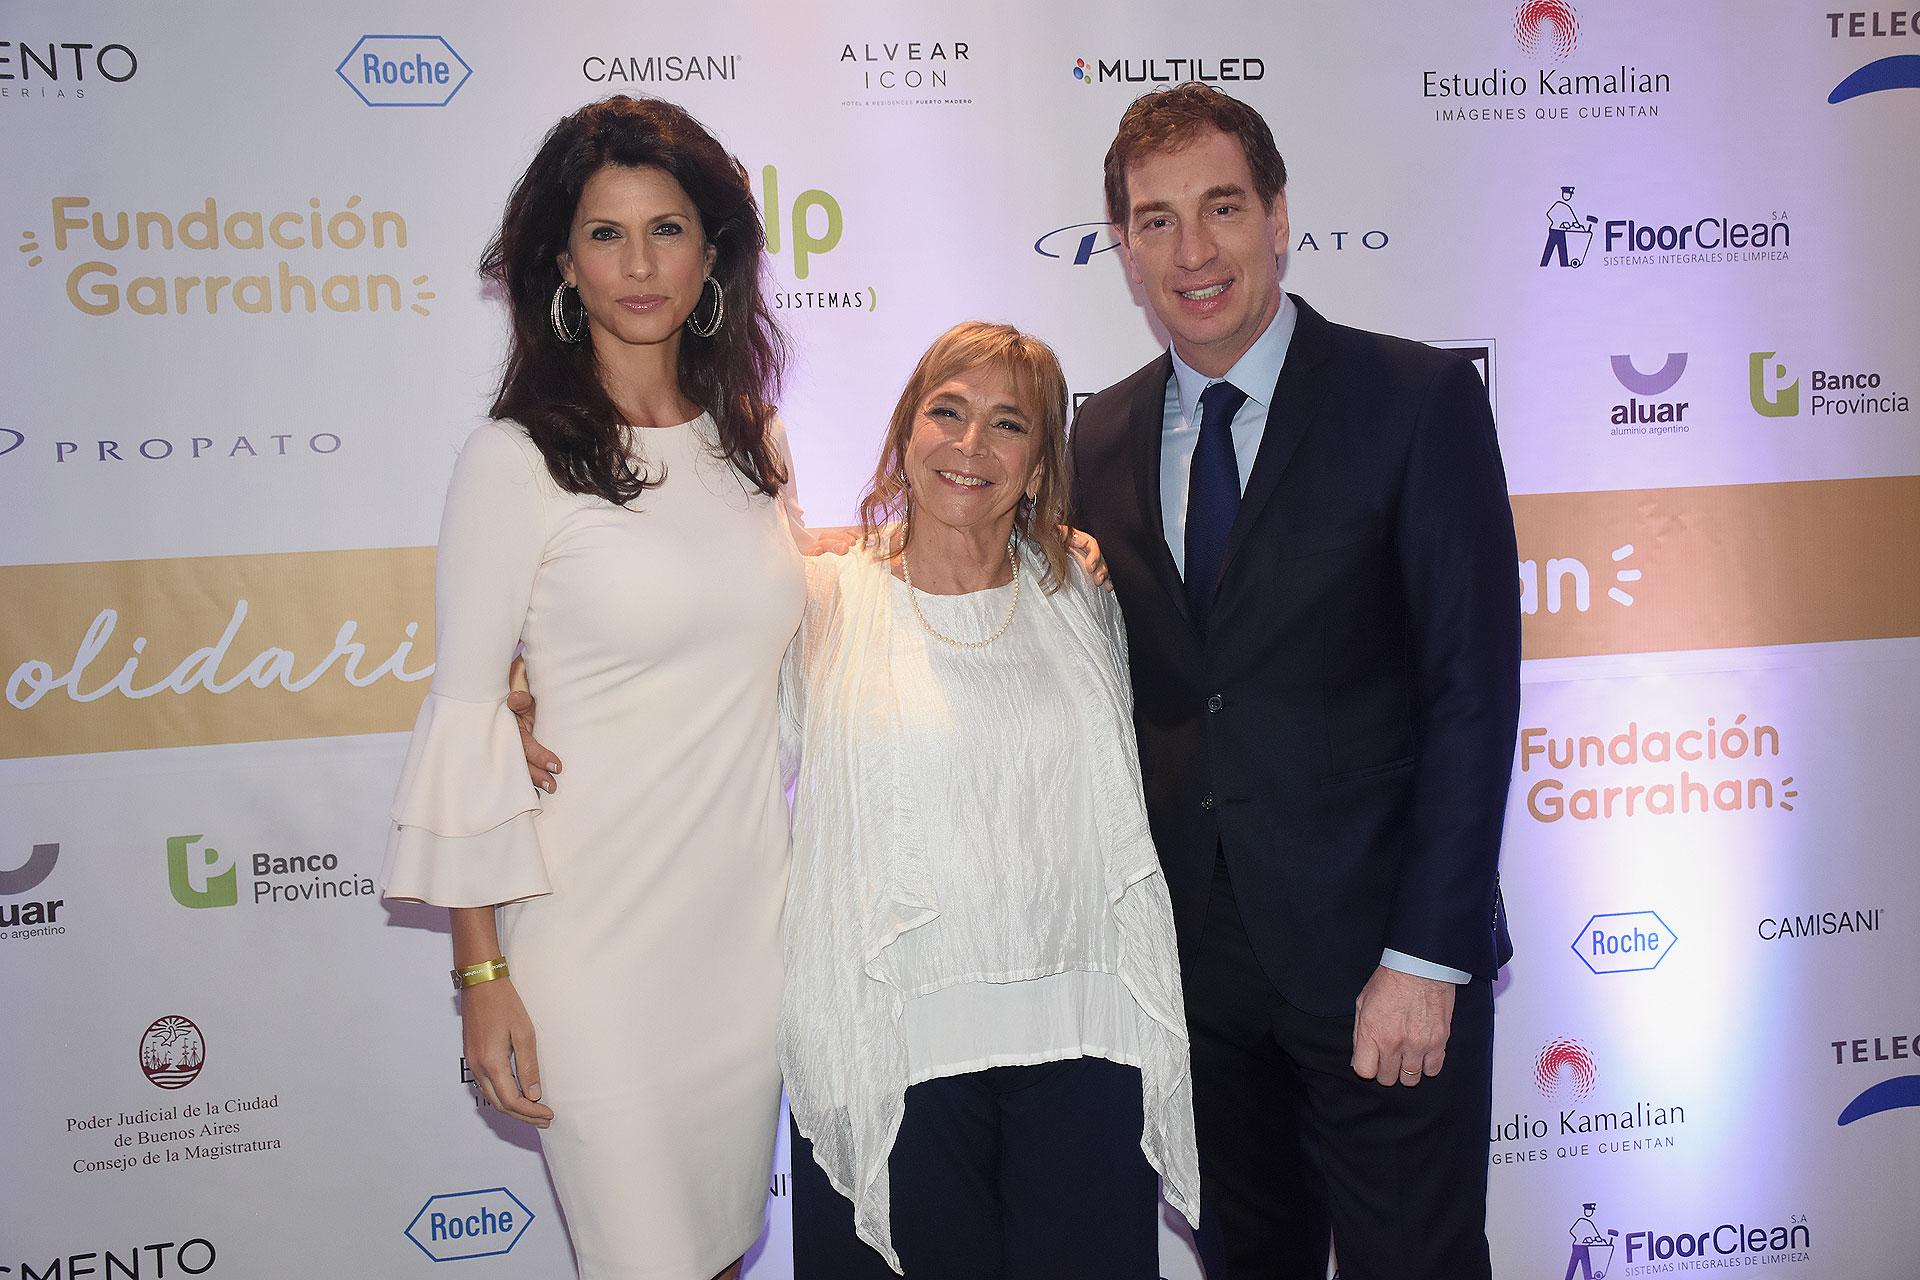 Diego Santilli y Analía Maiorana junto a Beatriz Reznik